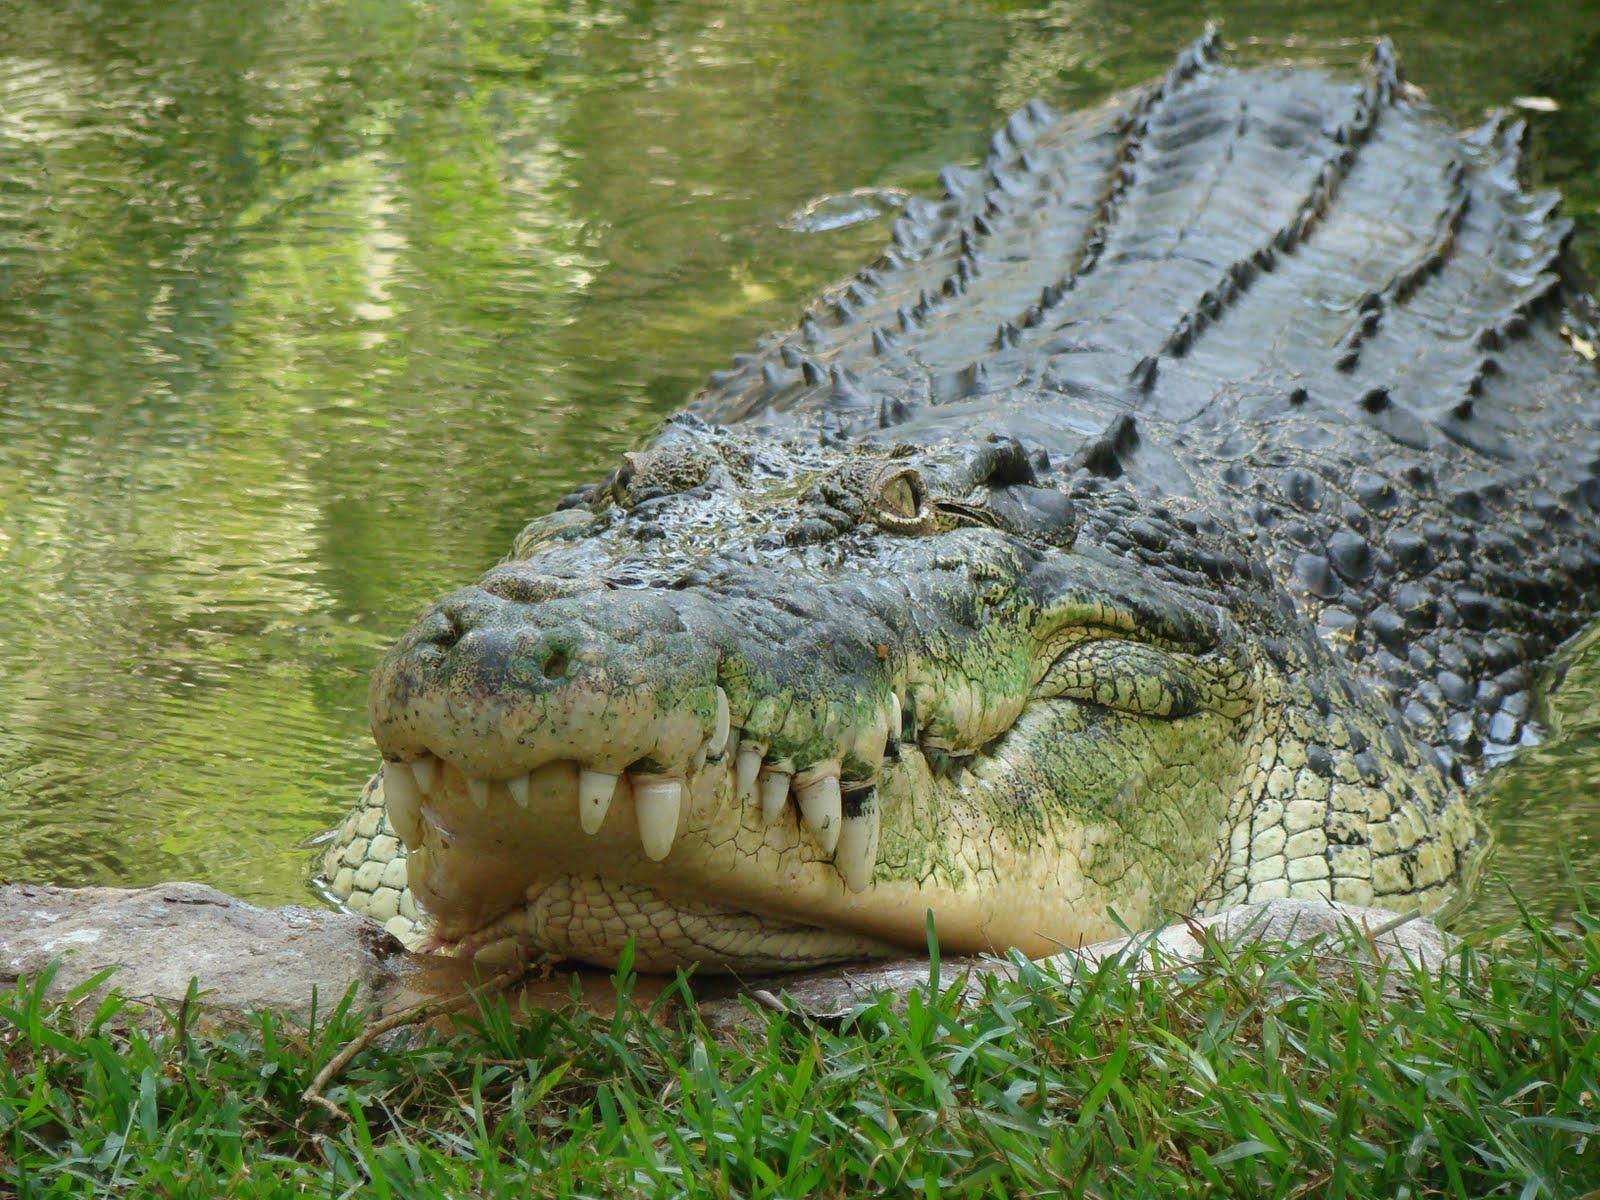 happy birthday croc bank